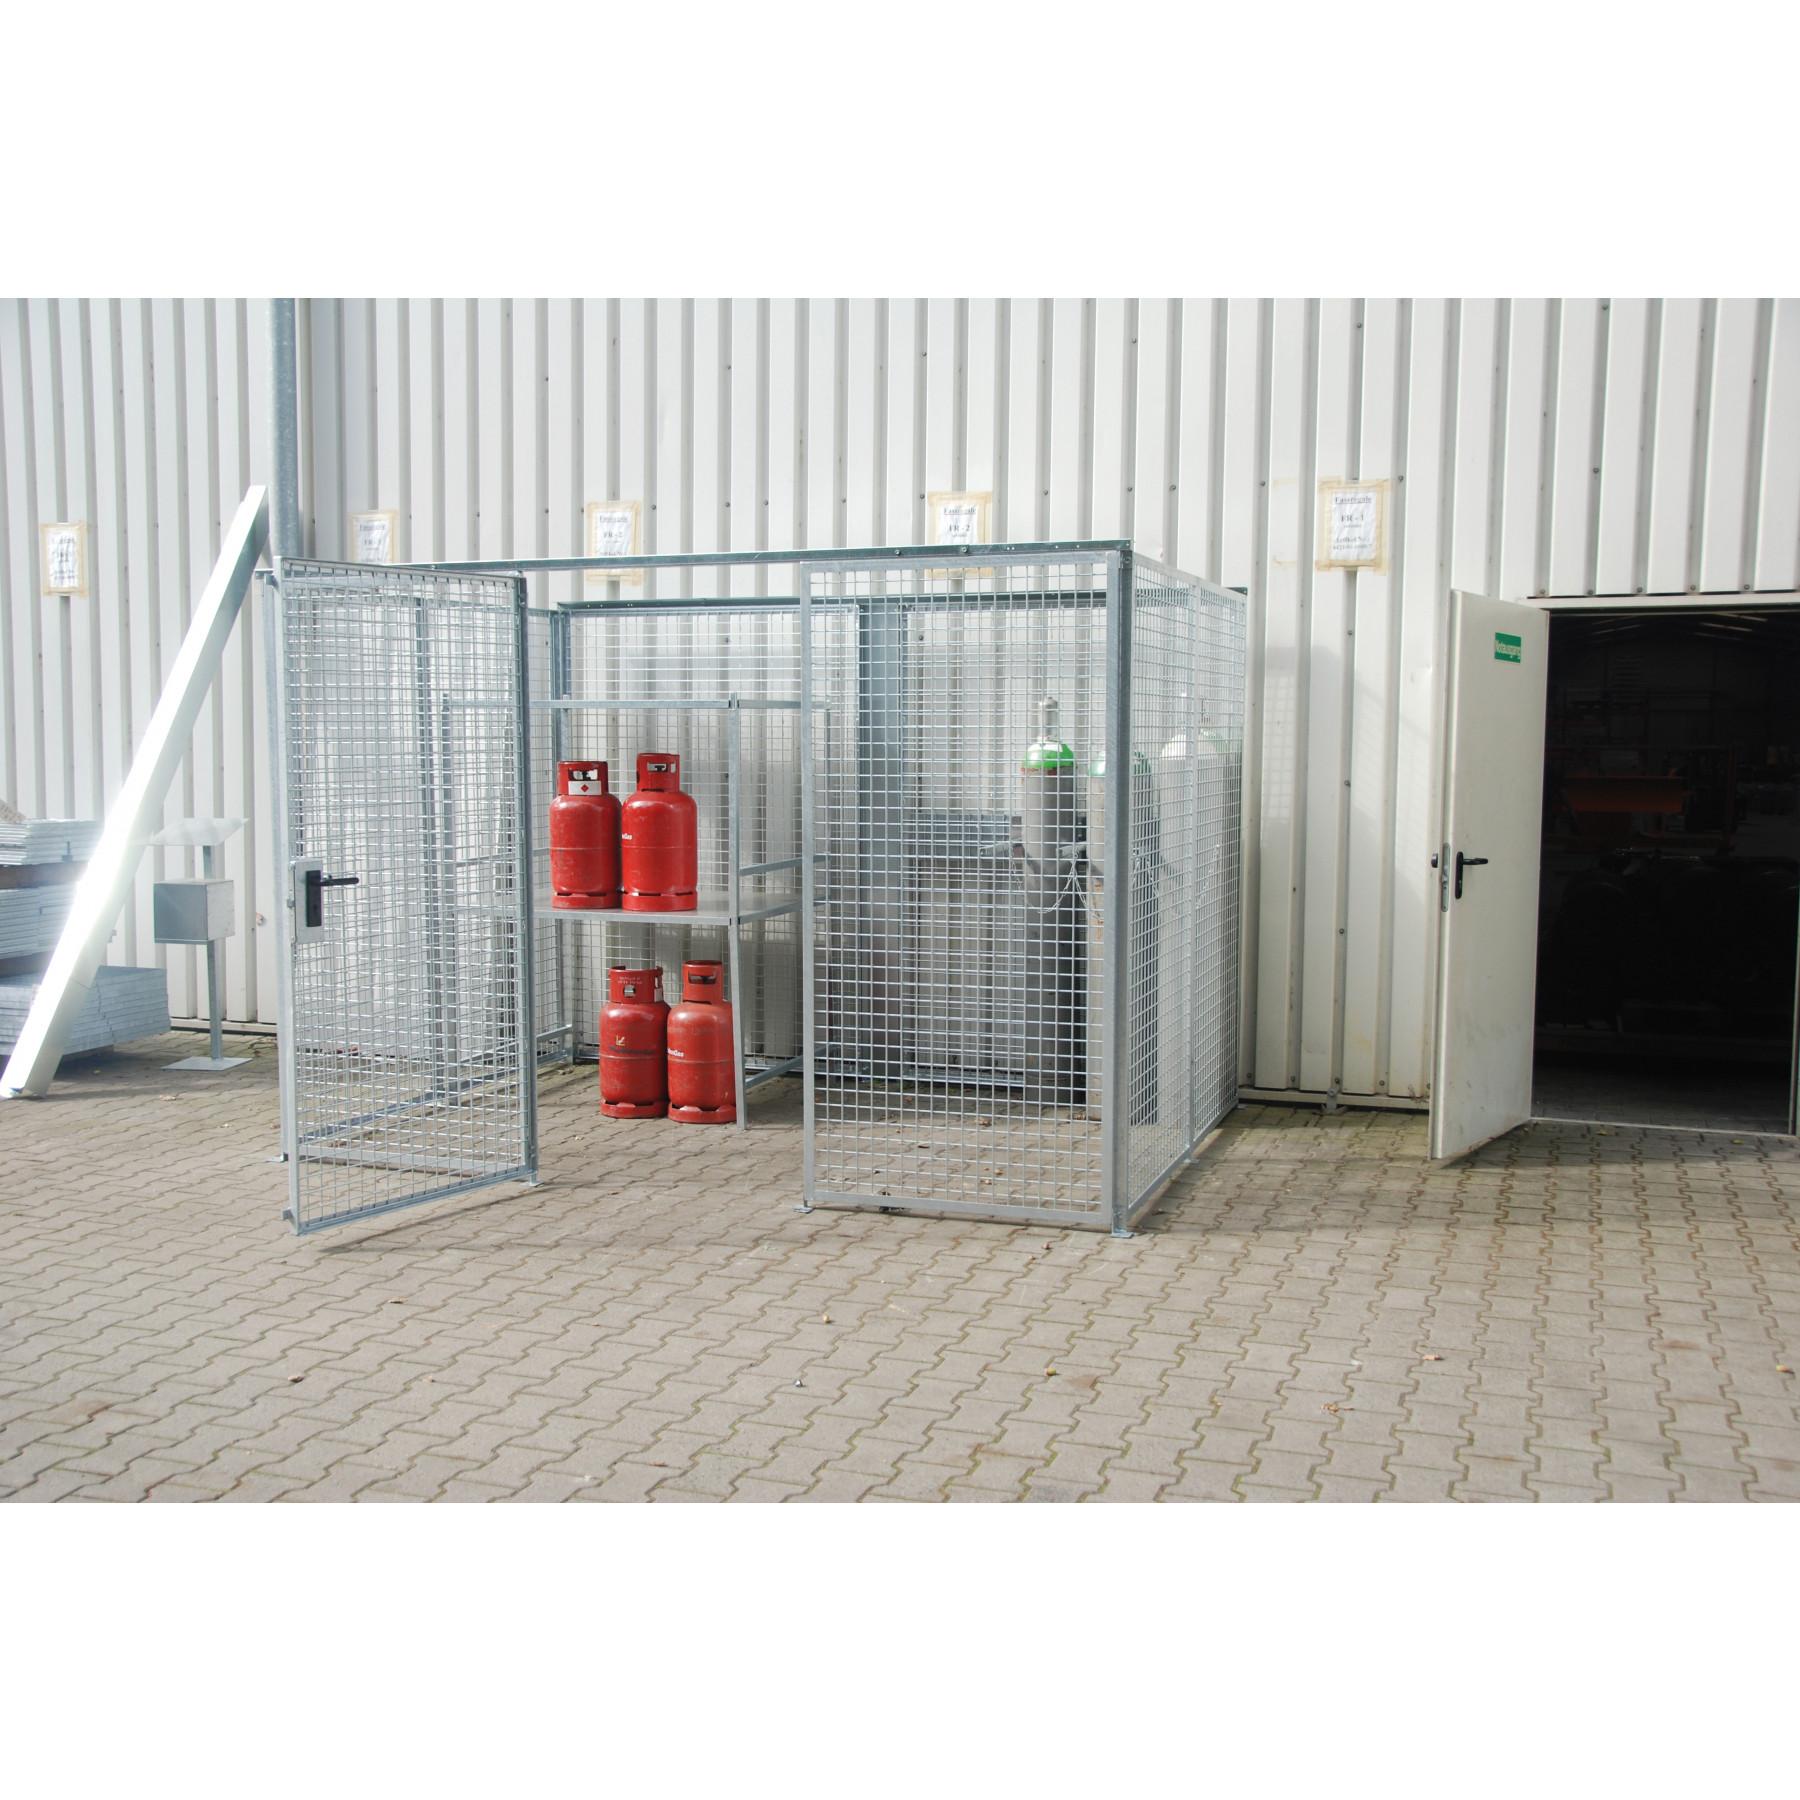 Gasflessencontainer zonder dak voor 48 gasflessen, GFC-M2